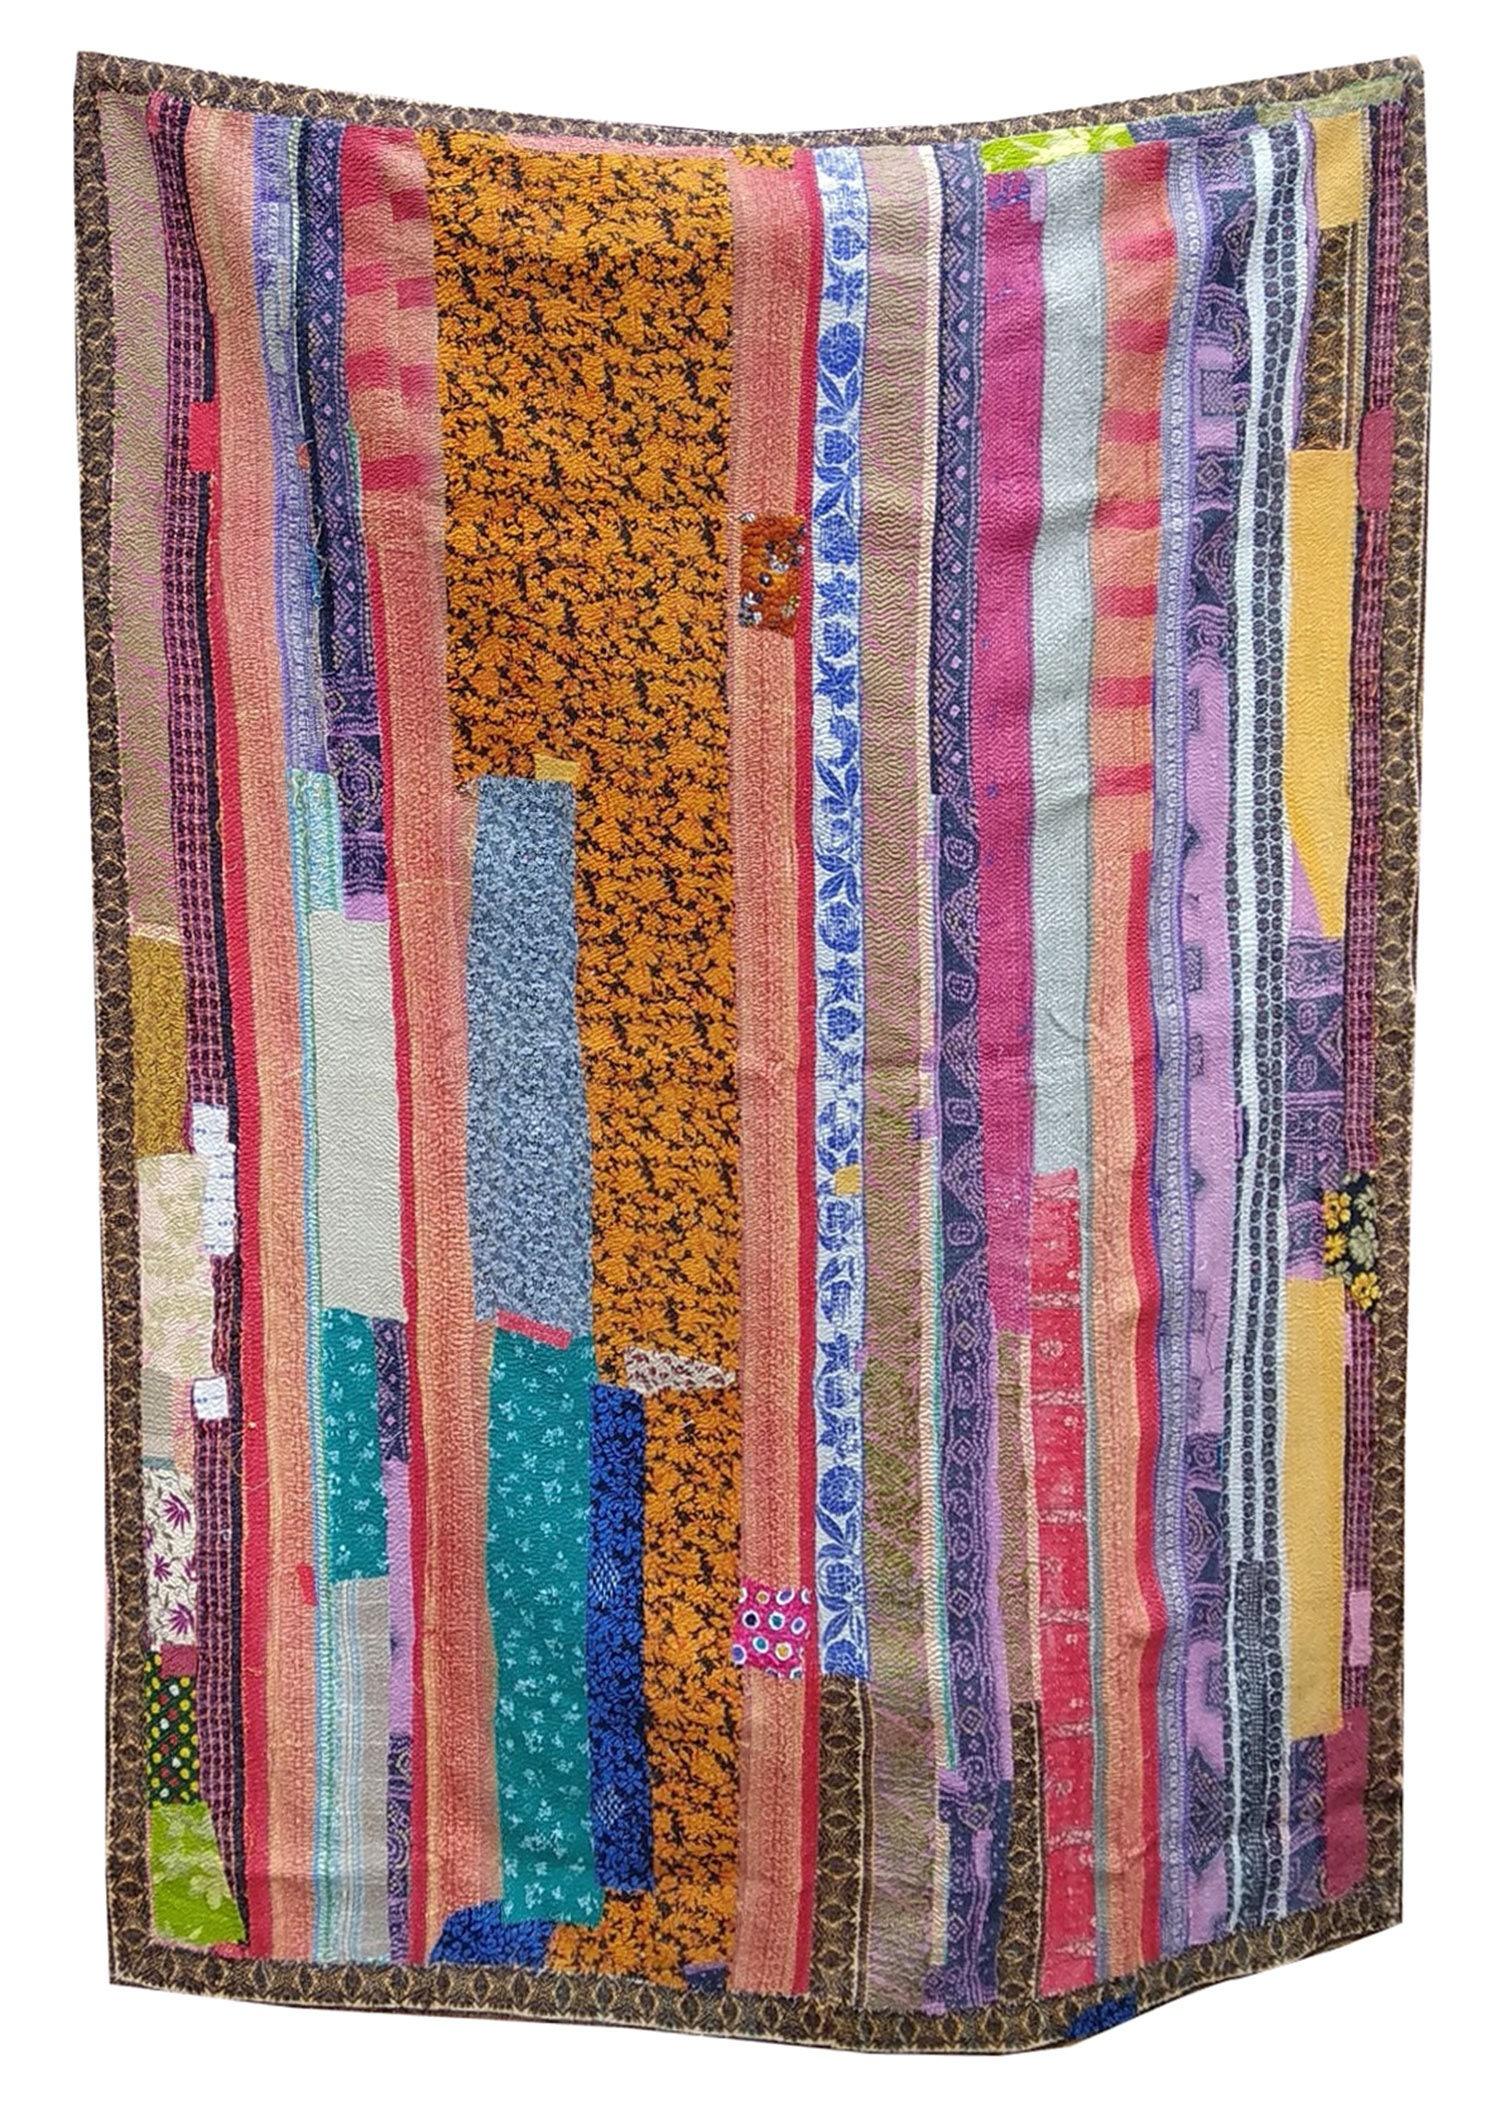 Vintage PURPLE  PINK Kantha Embroidery  Reversible Quilt Kantha Bedspread Indian Blanket Kantha Throw Coverlet Decorative Throw